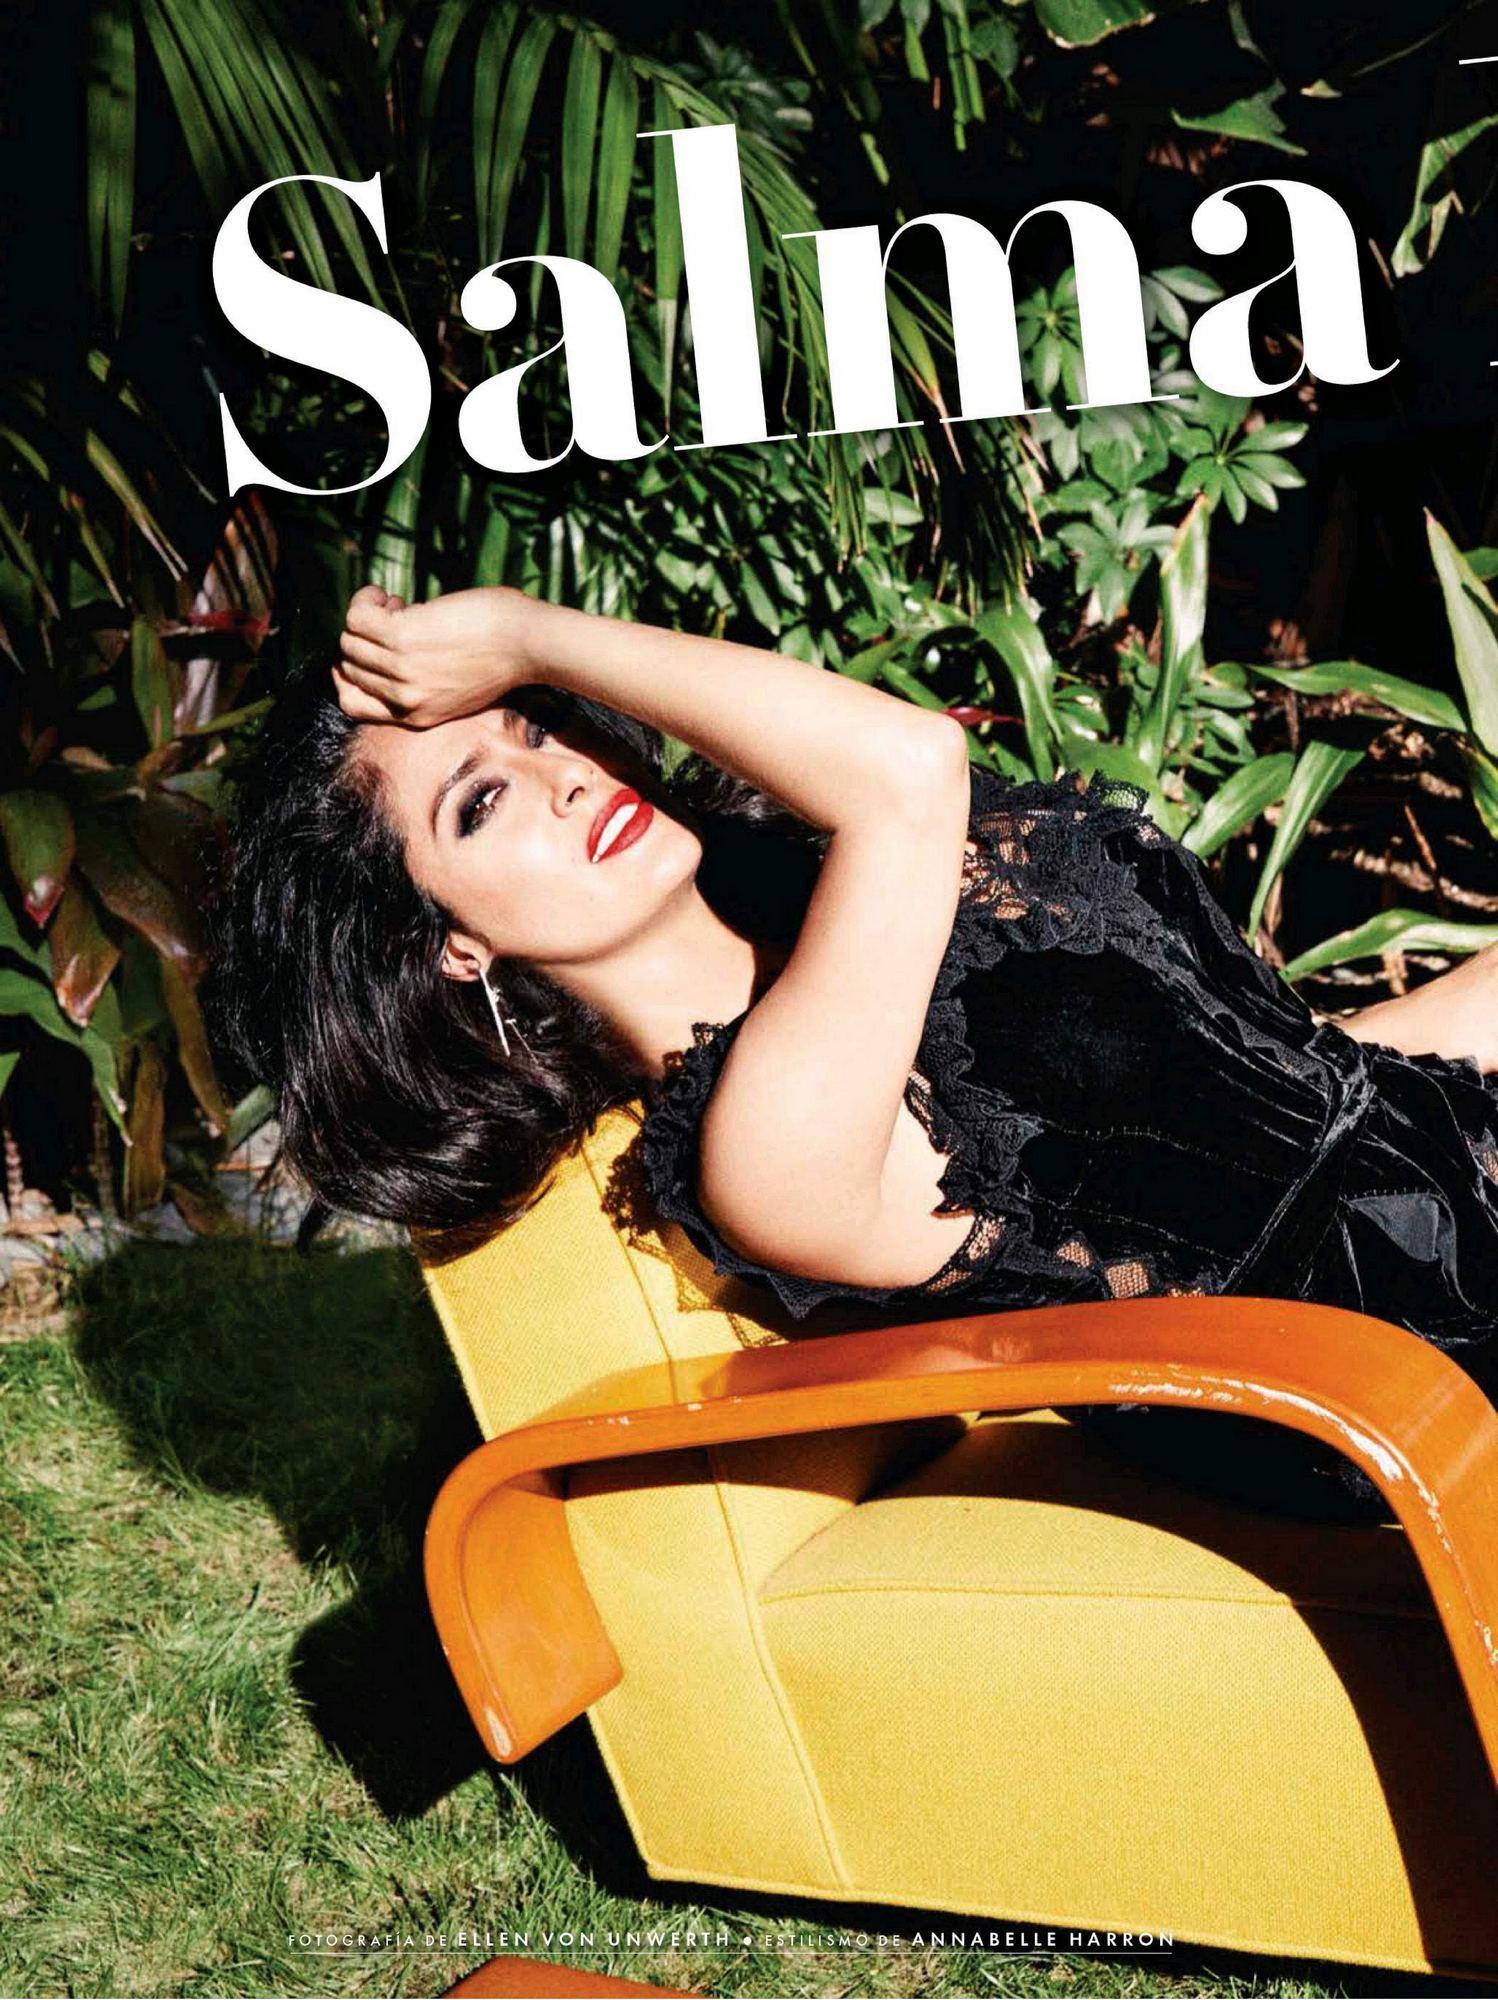 Salma-Hayek-Vanity-Fair-September-2018Salma-Hayek-Vanity-Fair-September-2018a37a67953201114.jpg